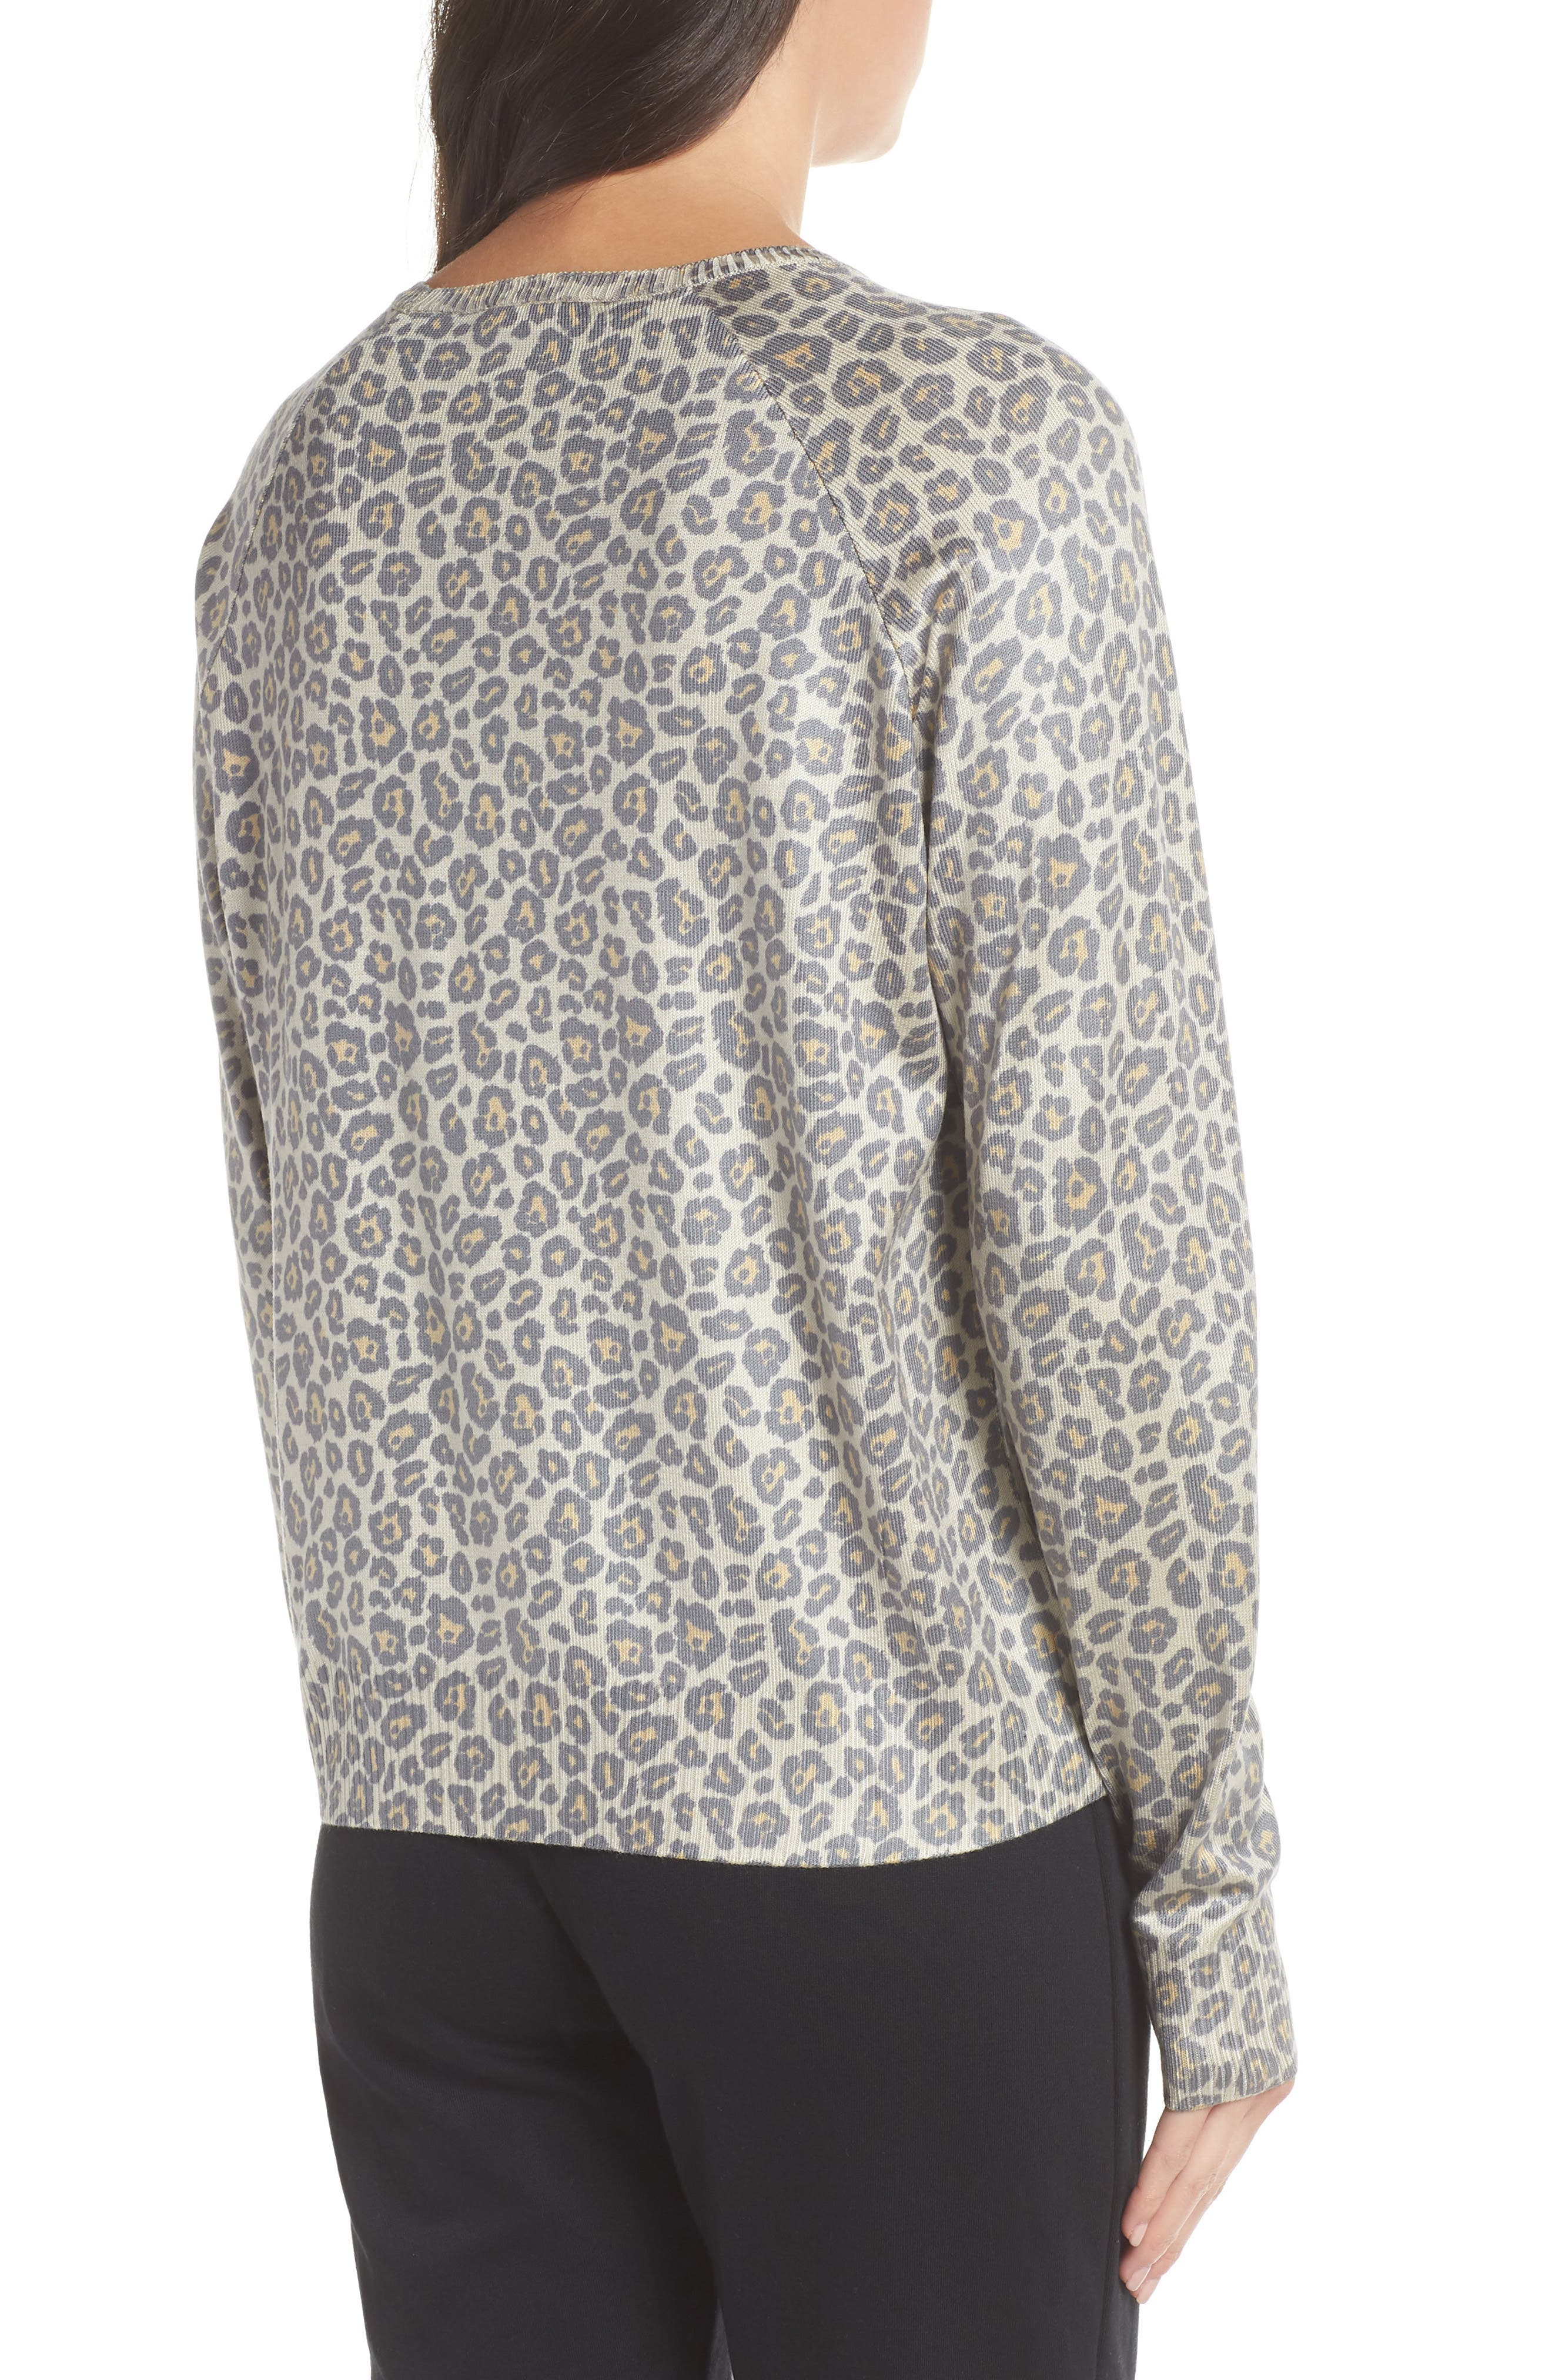 Leopard Print Sweatshirt,                             Alternate thumbnail 2, color,                             Beige Leopard